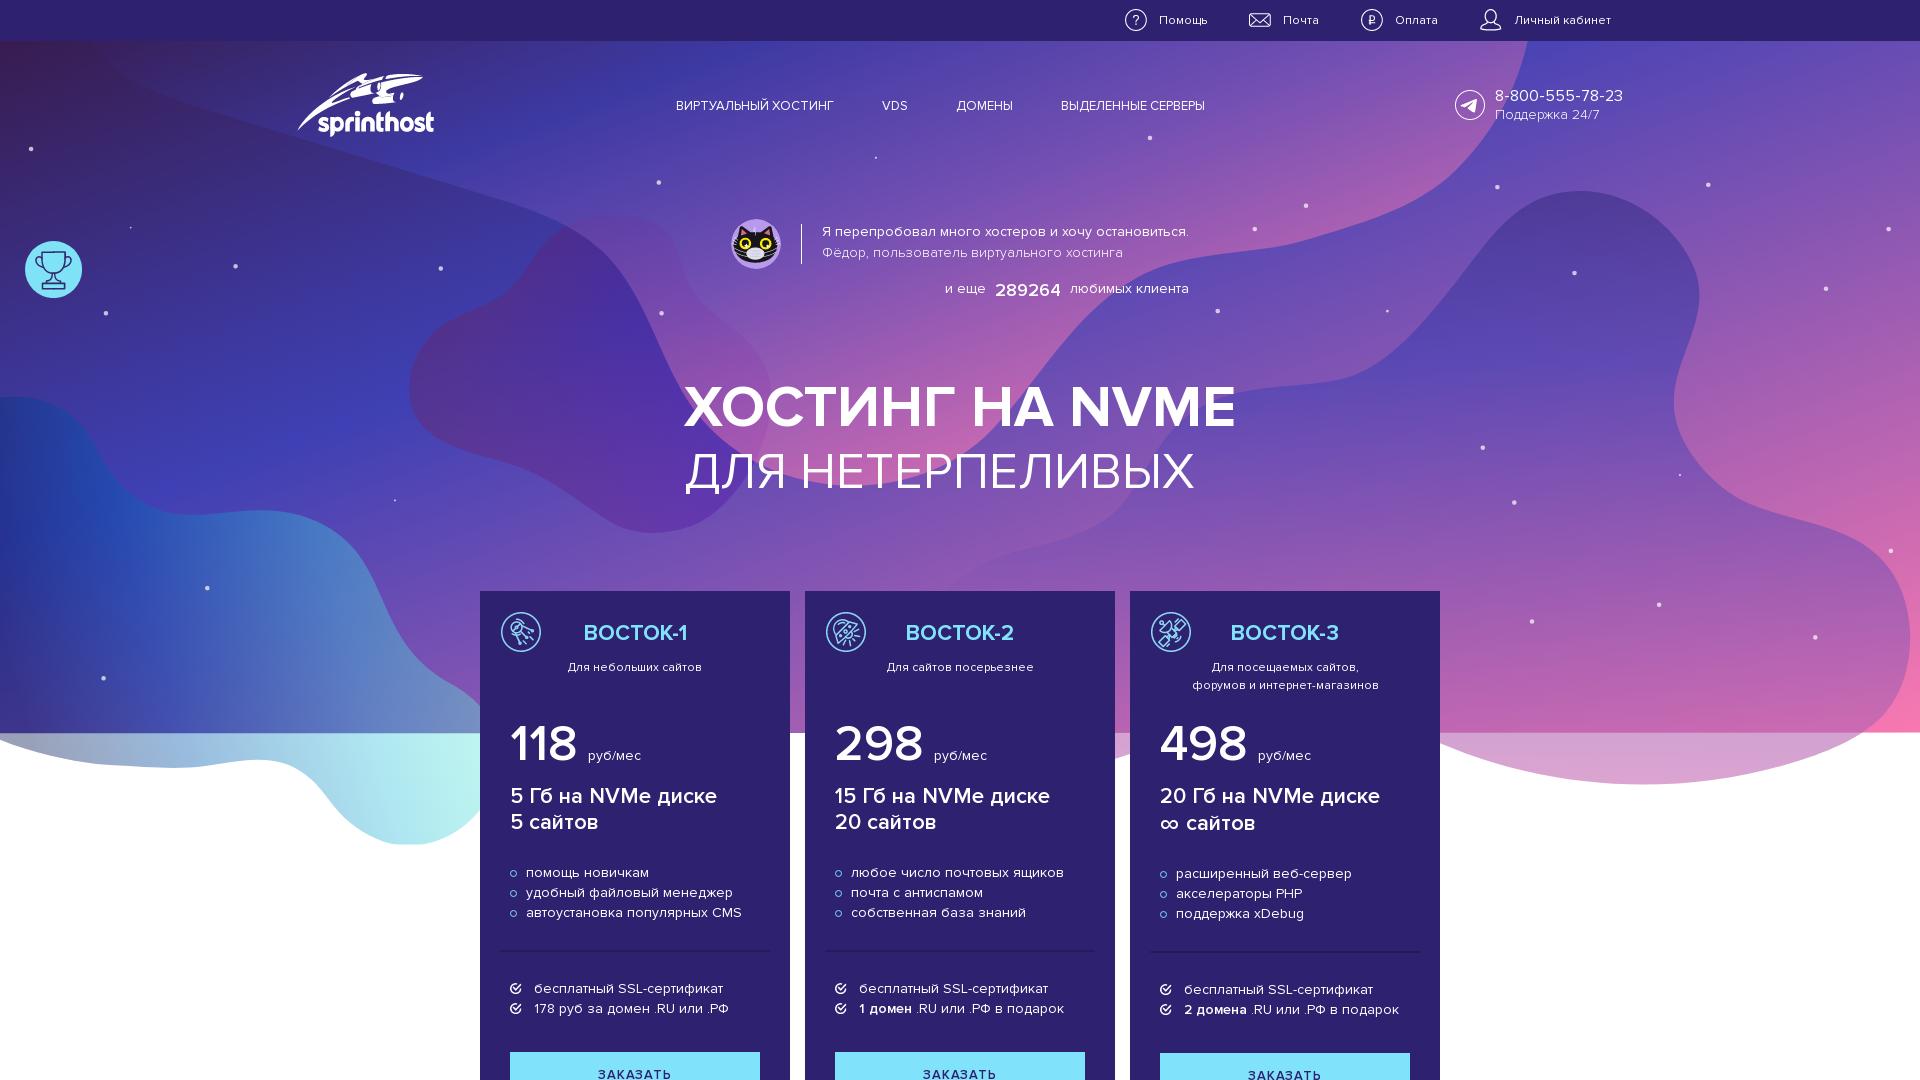 Sprinthost website